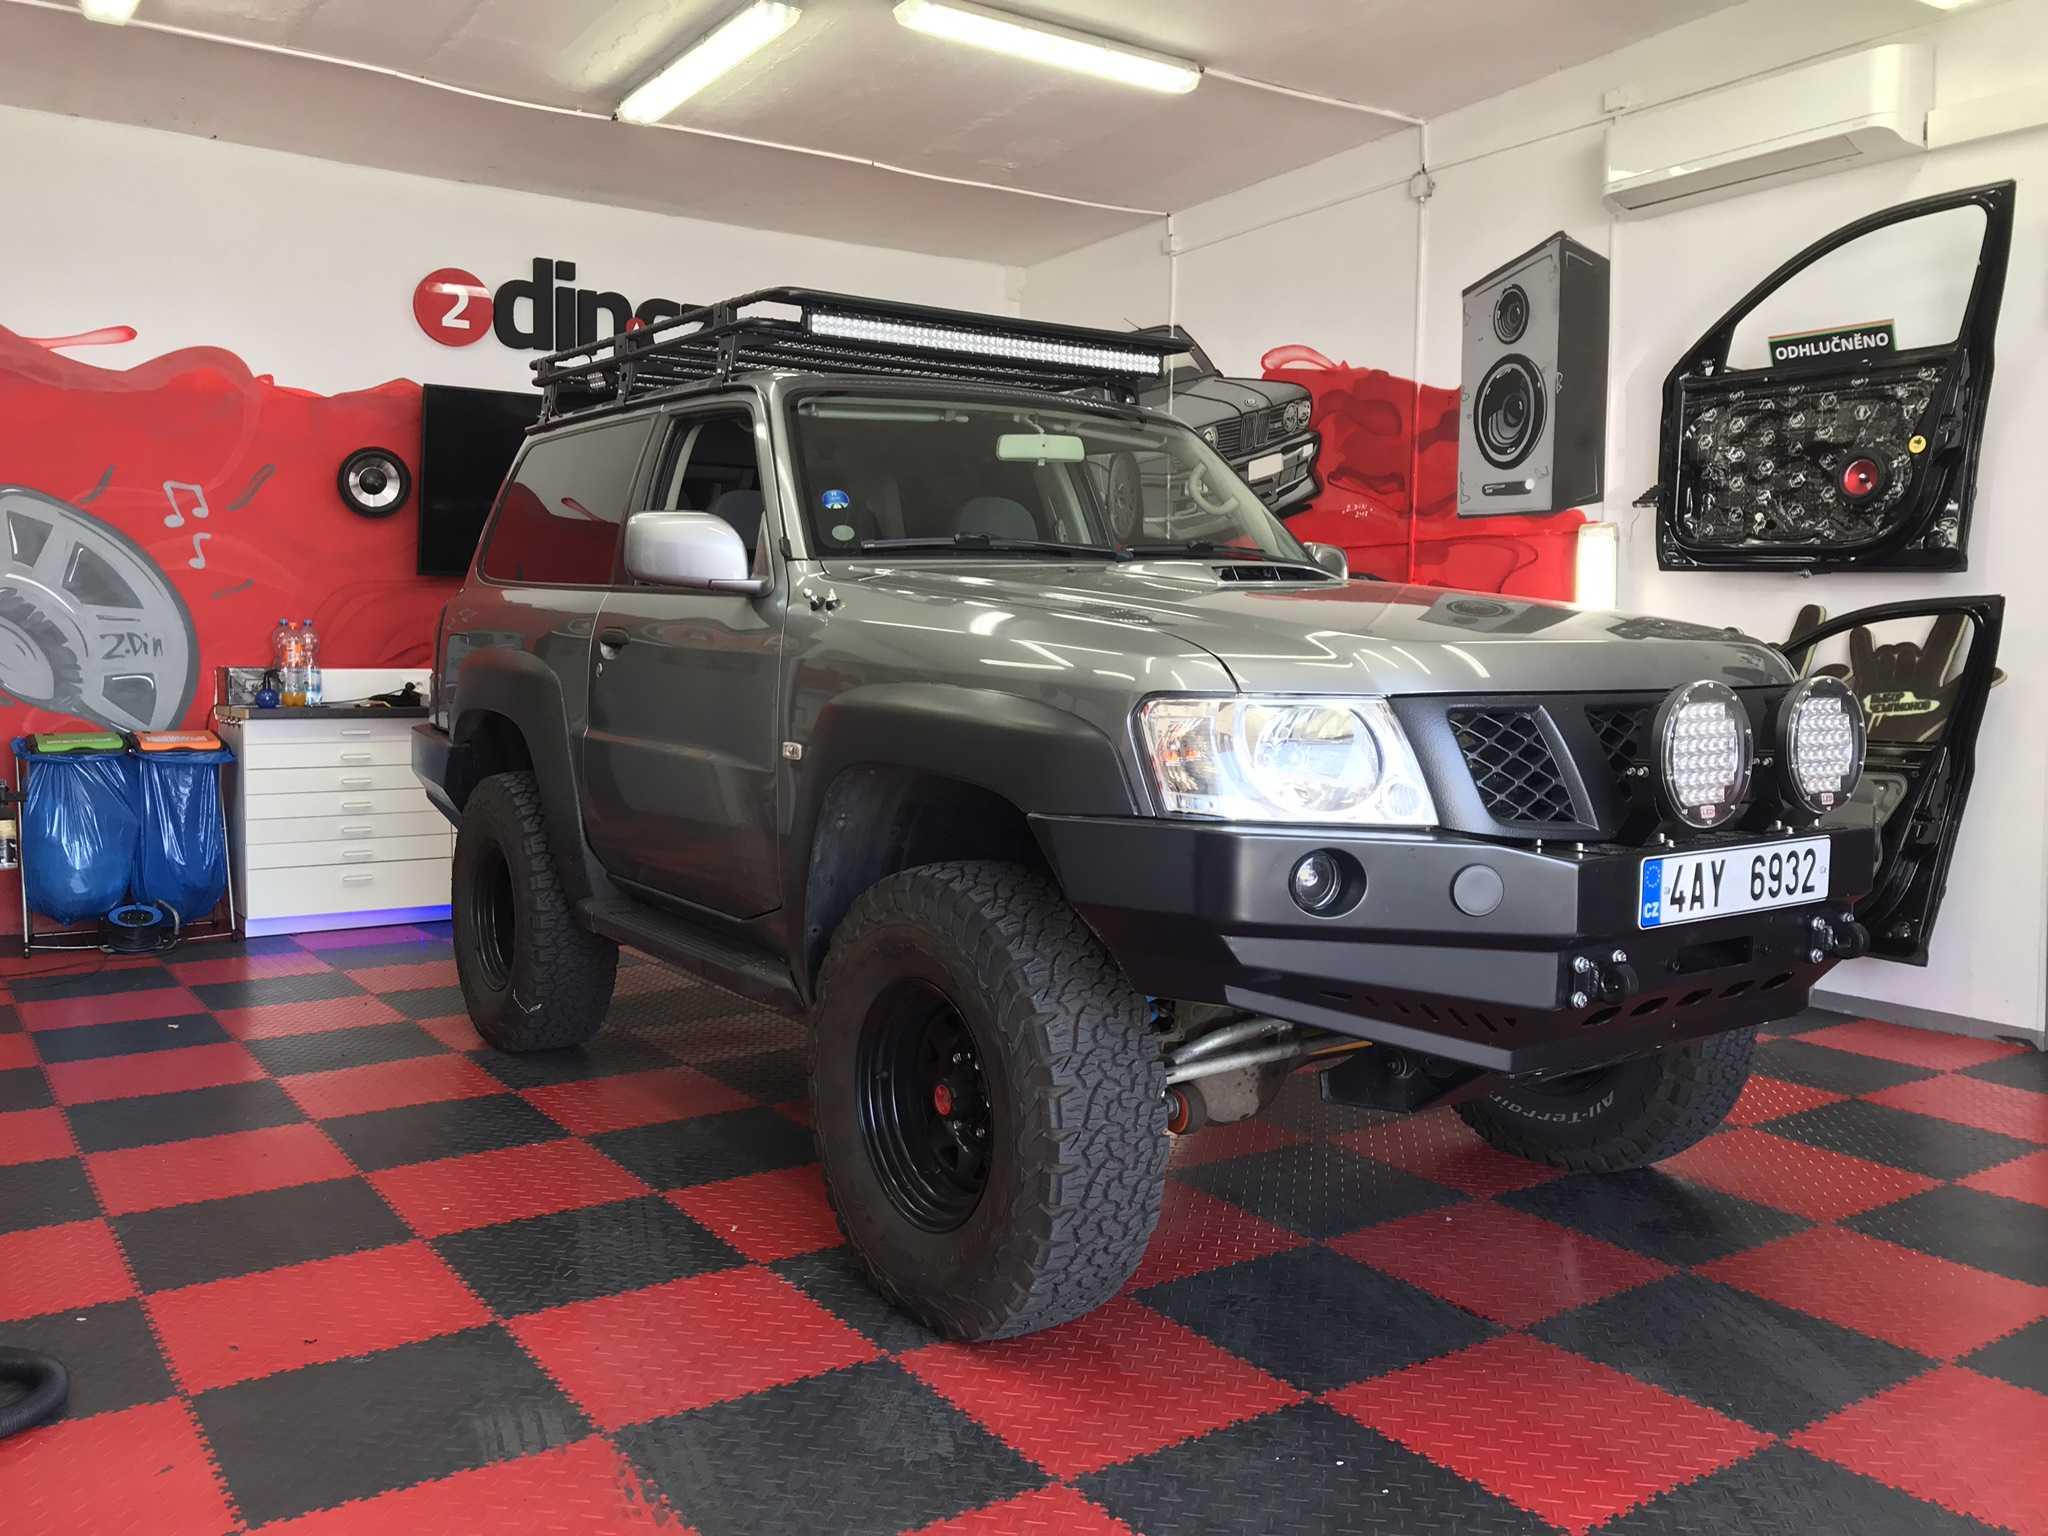 Nissan Patrol - Montáž 2din autorádia s CarPlay